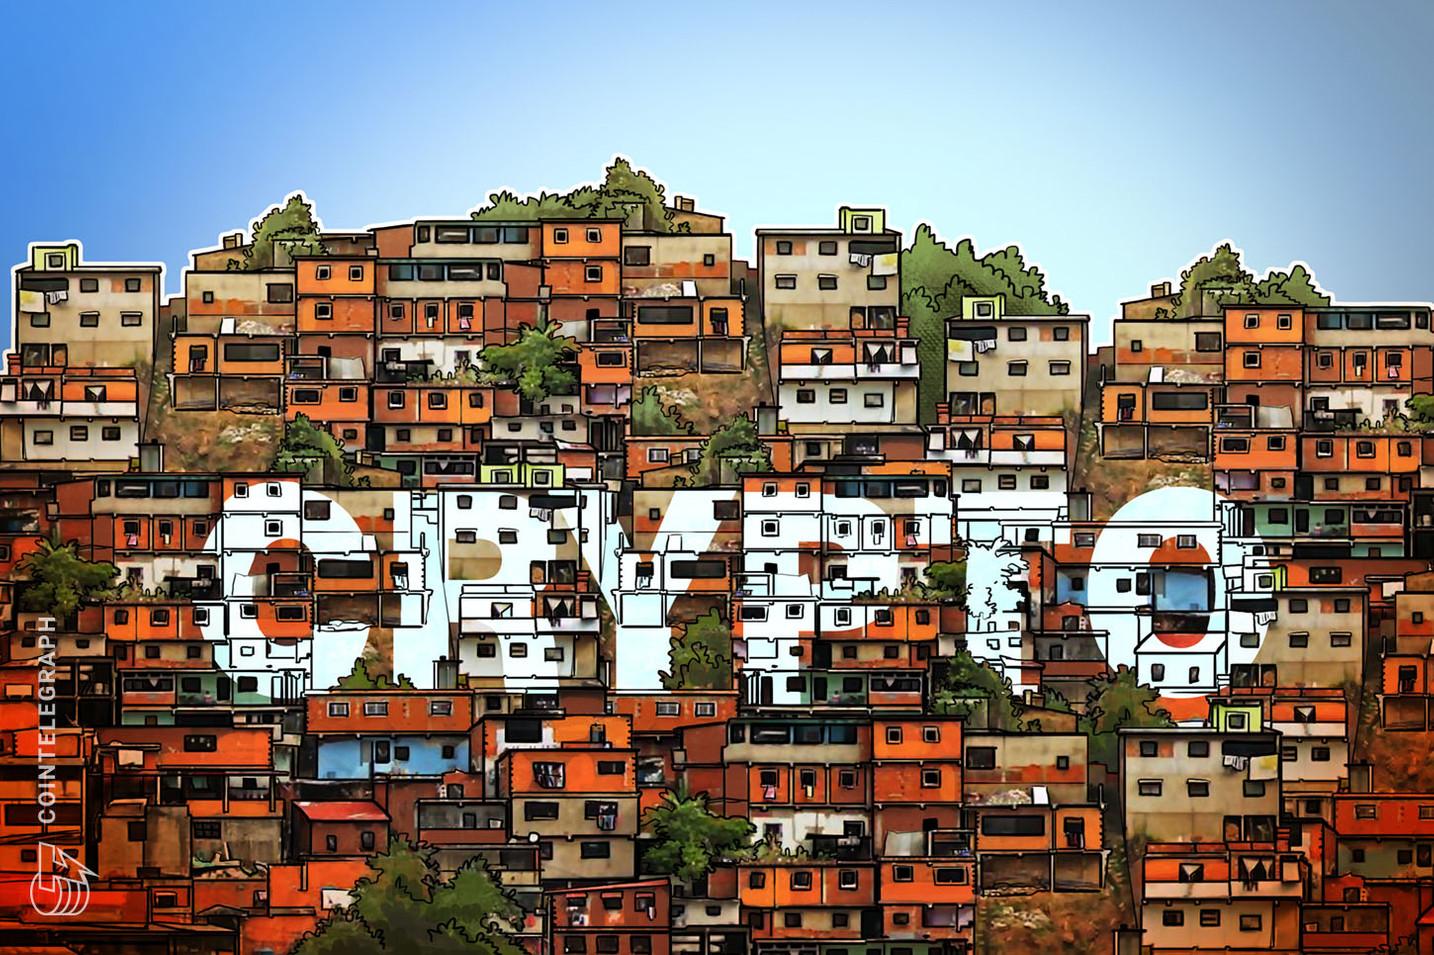 Bitcoin Acceptance Skyrockets in Venezuela Amid Hyperinflation Crisis